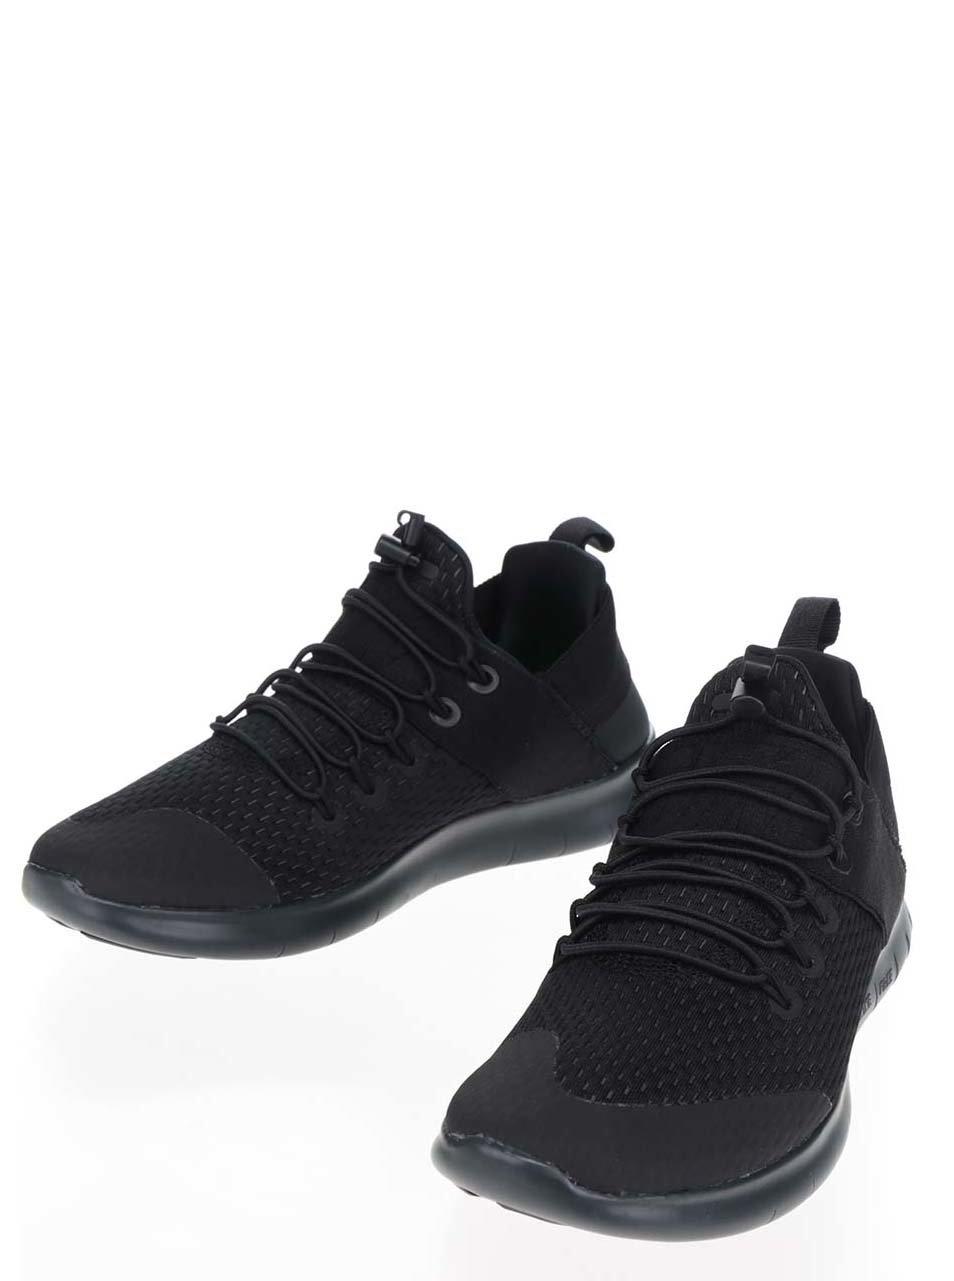 Čierne dámske tenisky Nike Free Commuter ... 2f2117f2121